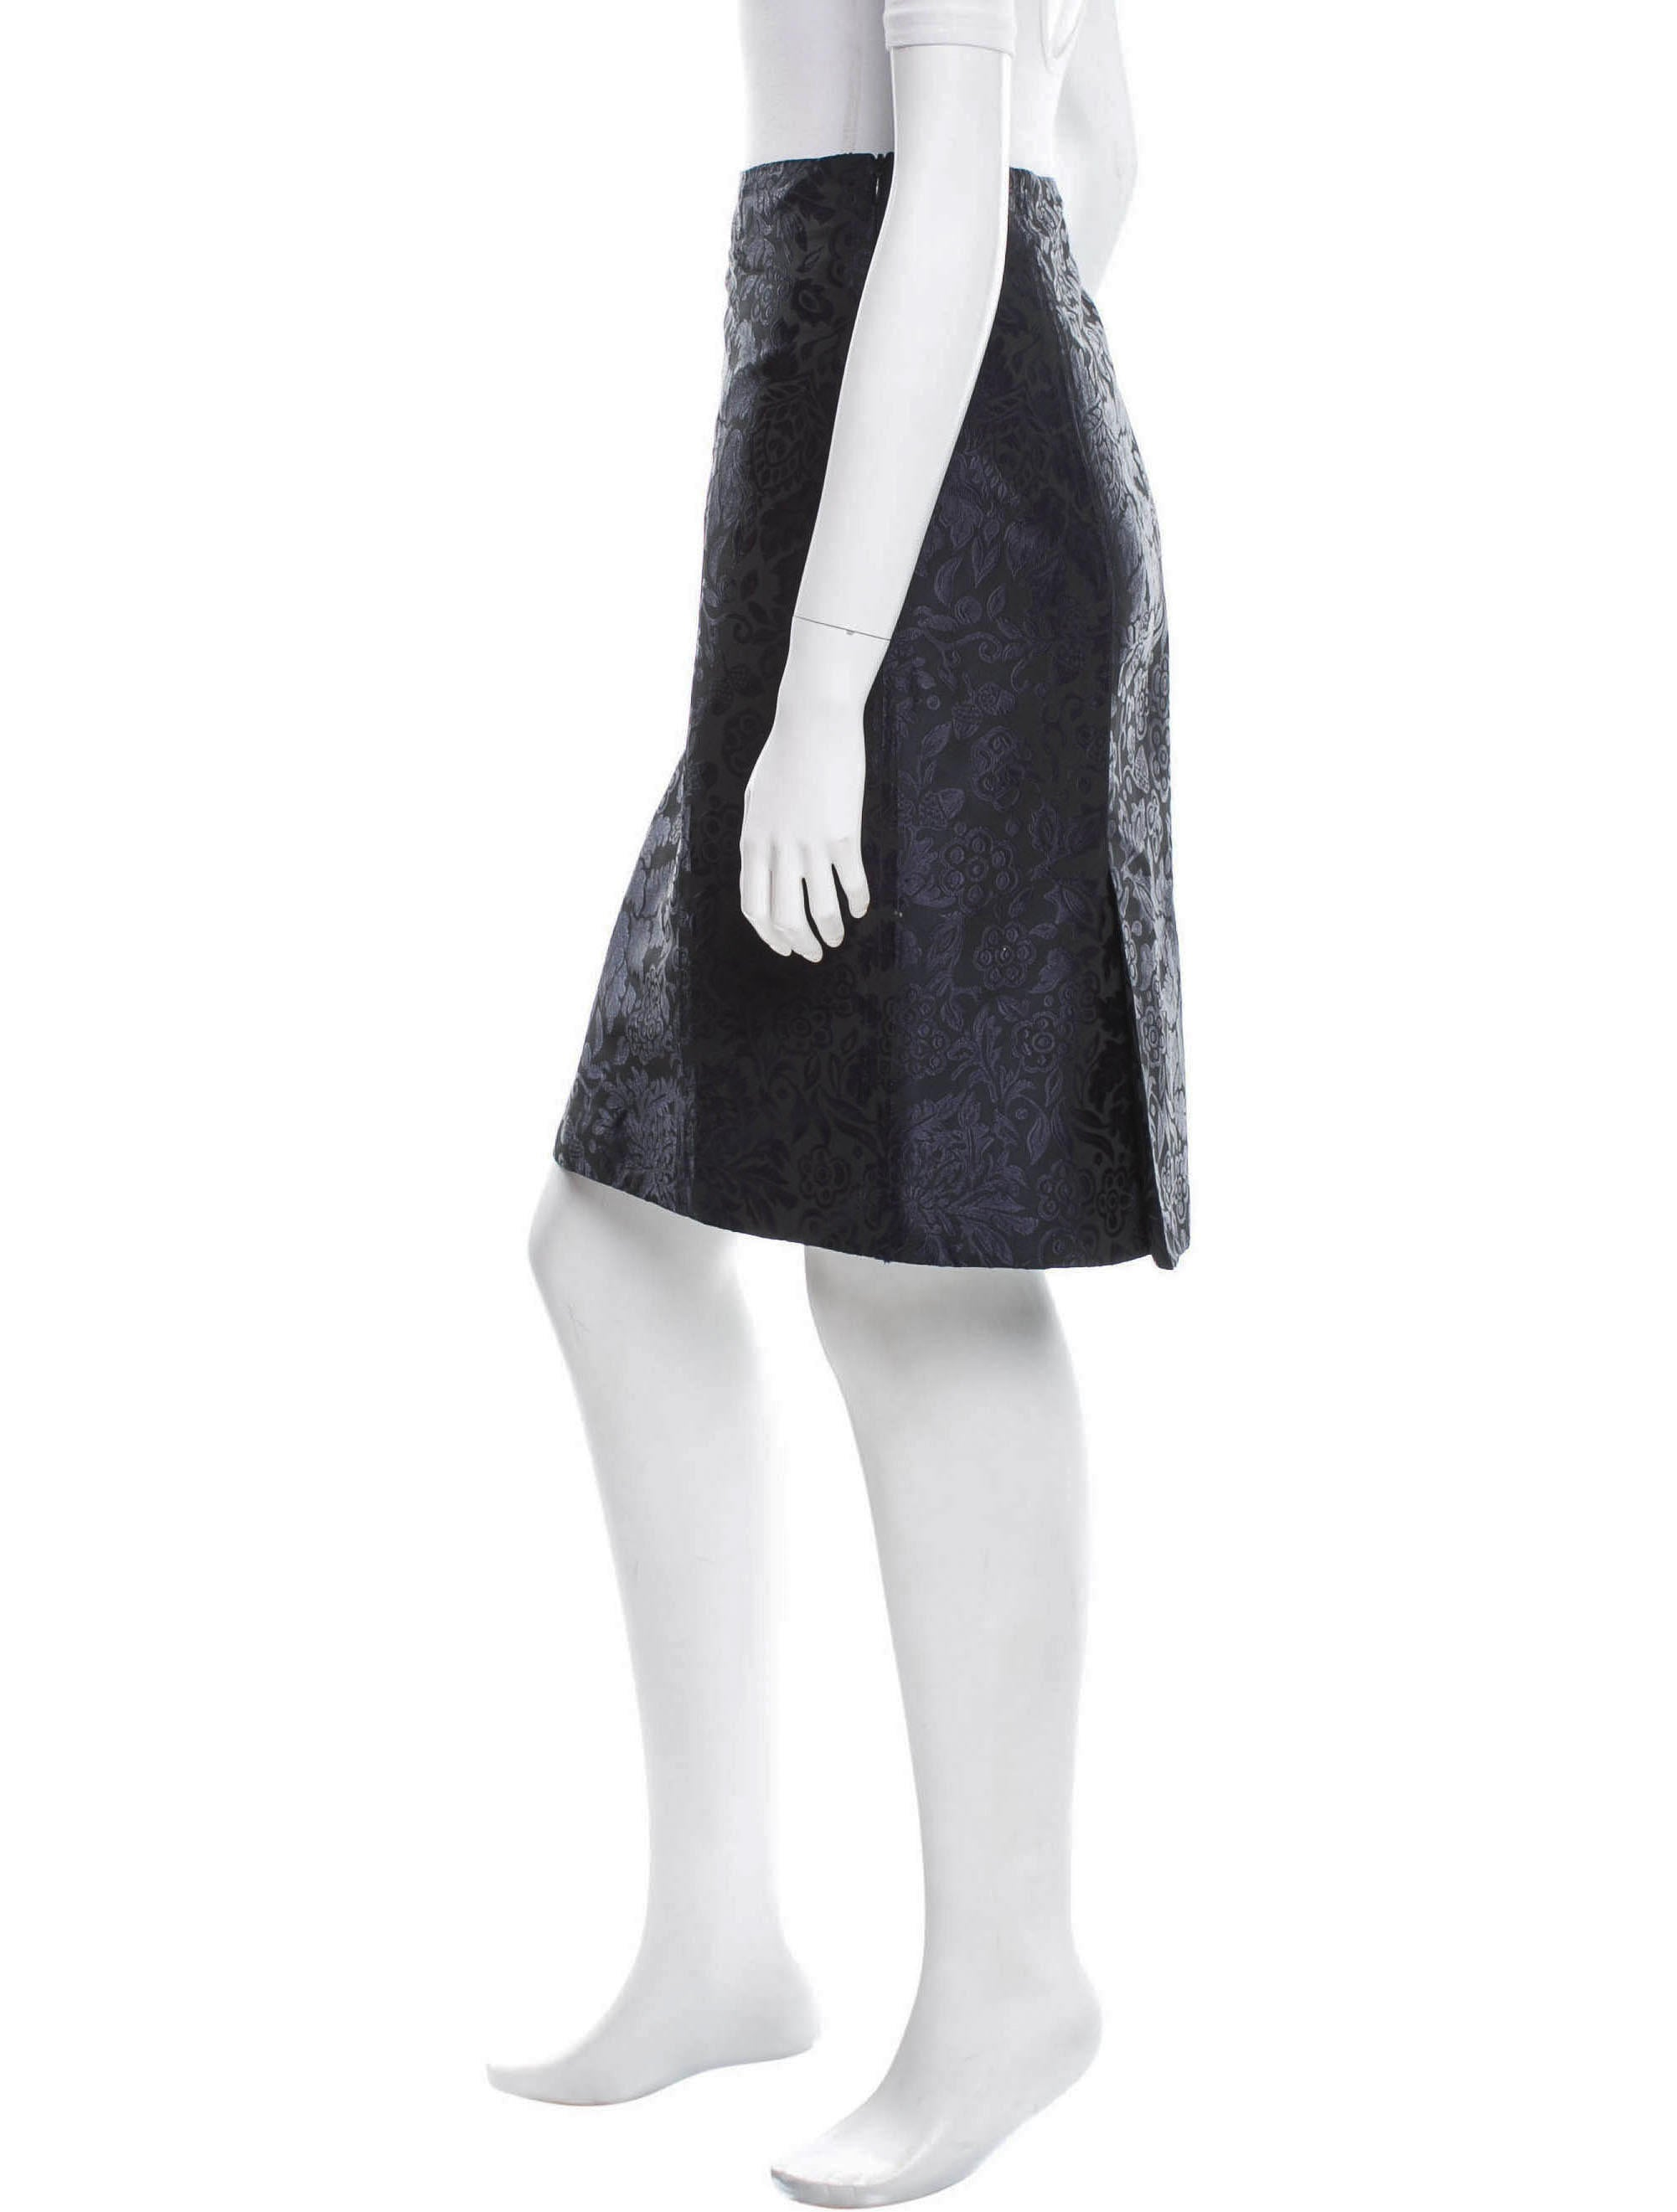 burberry patterned pencil skirt clothing bur46238